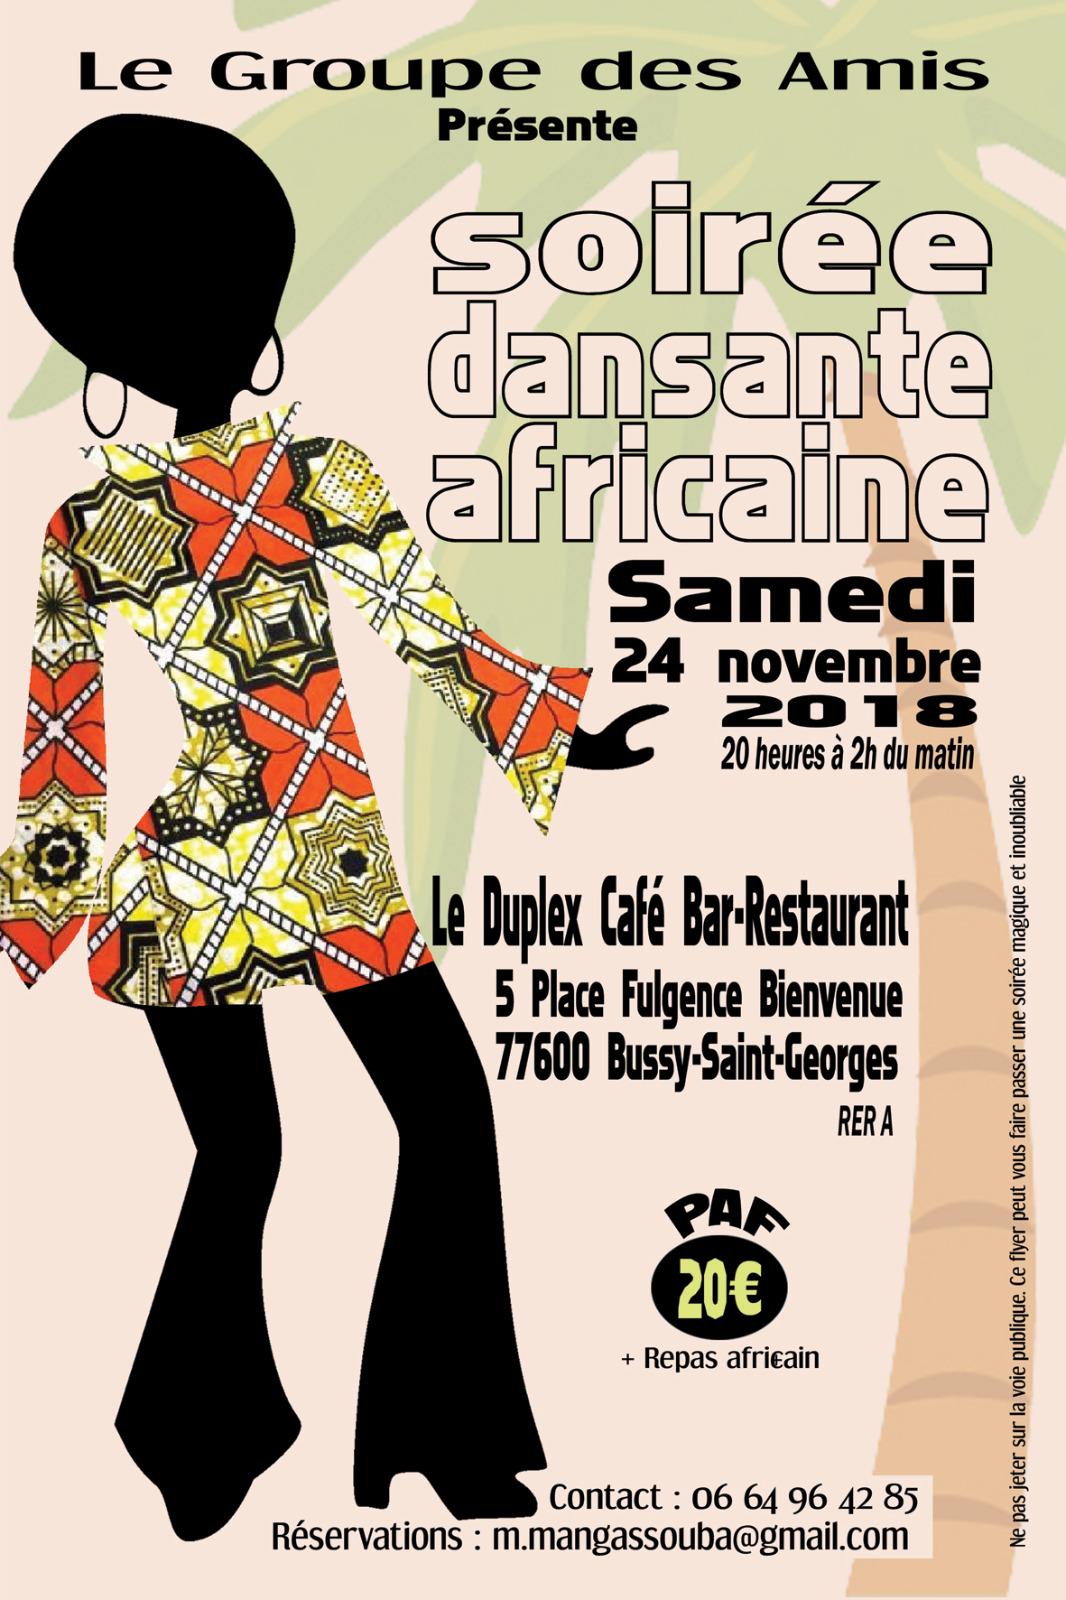 Soirée Africaine Samedi 24 novembre 2018